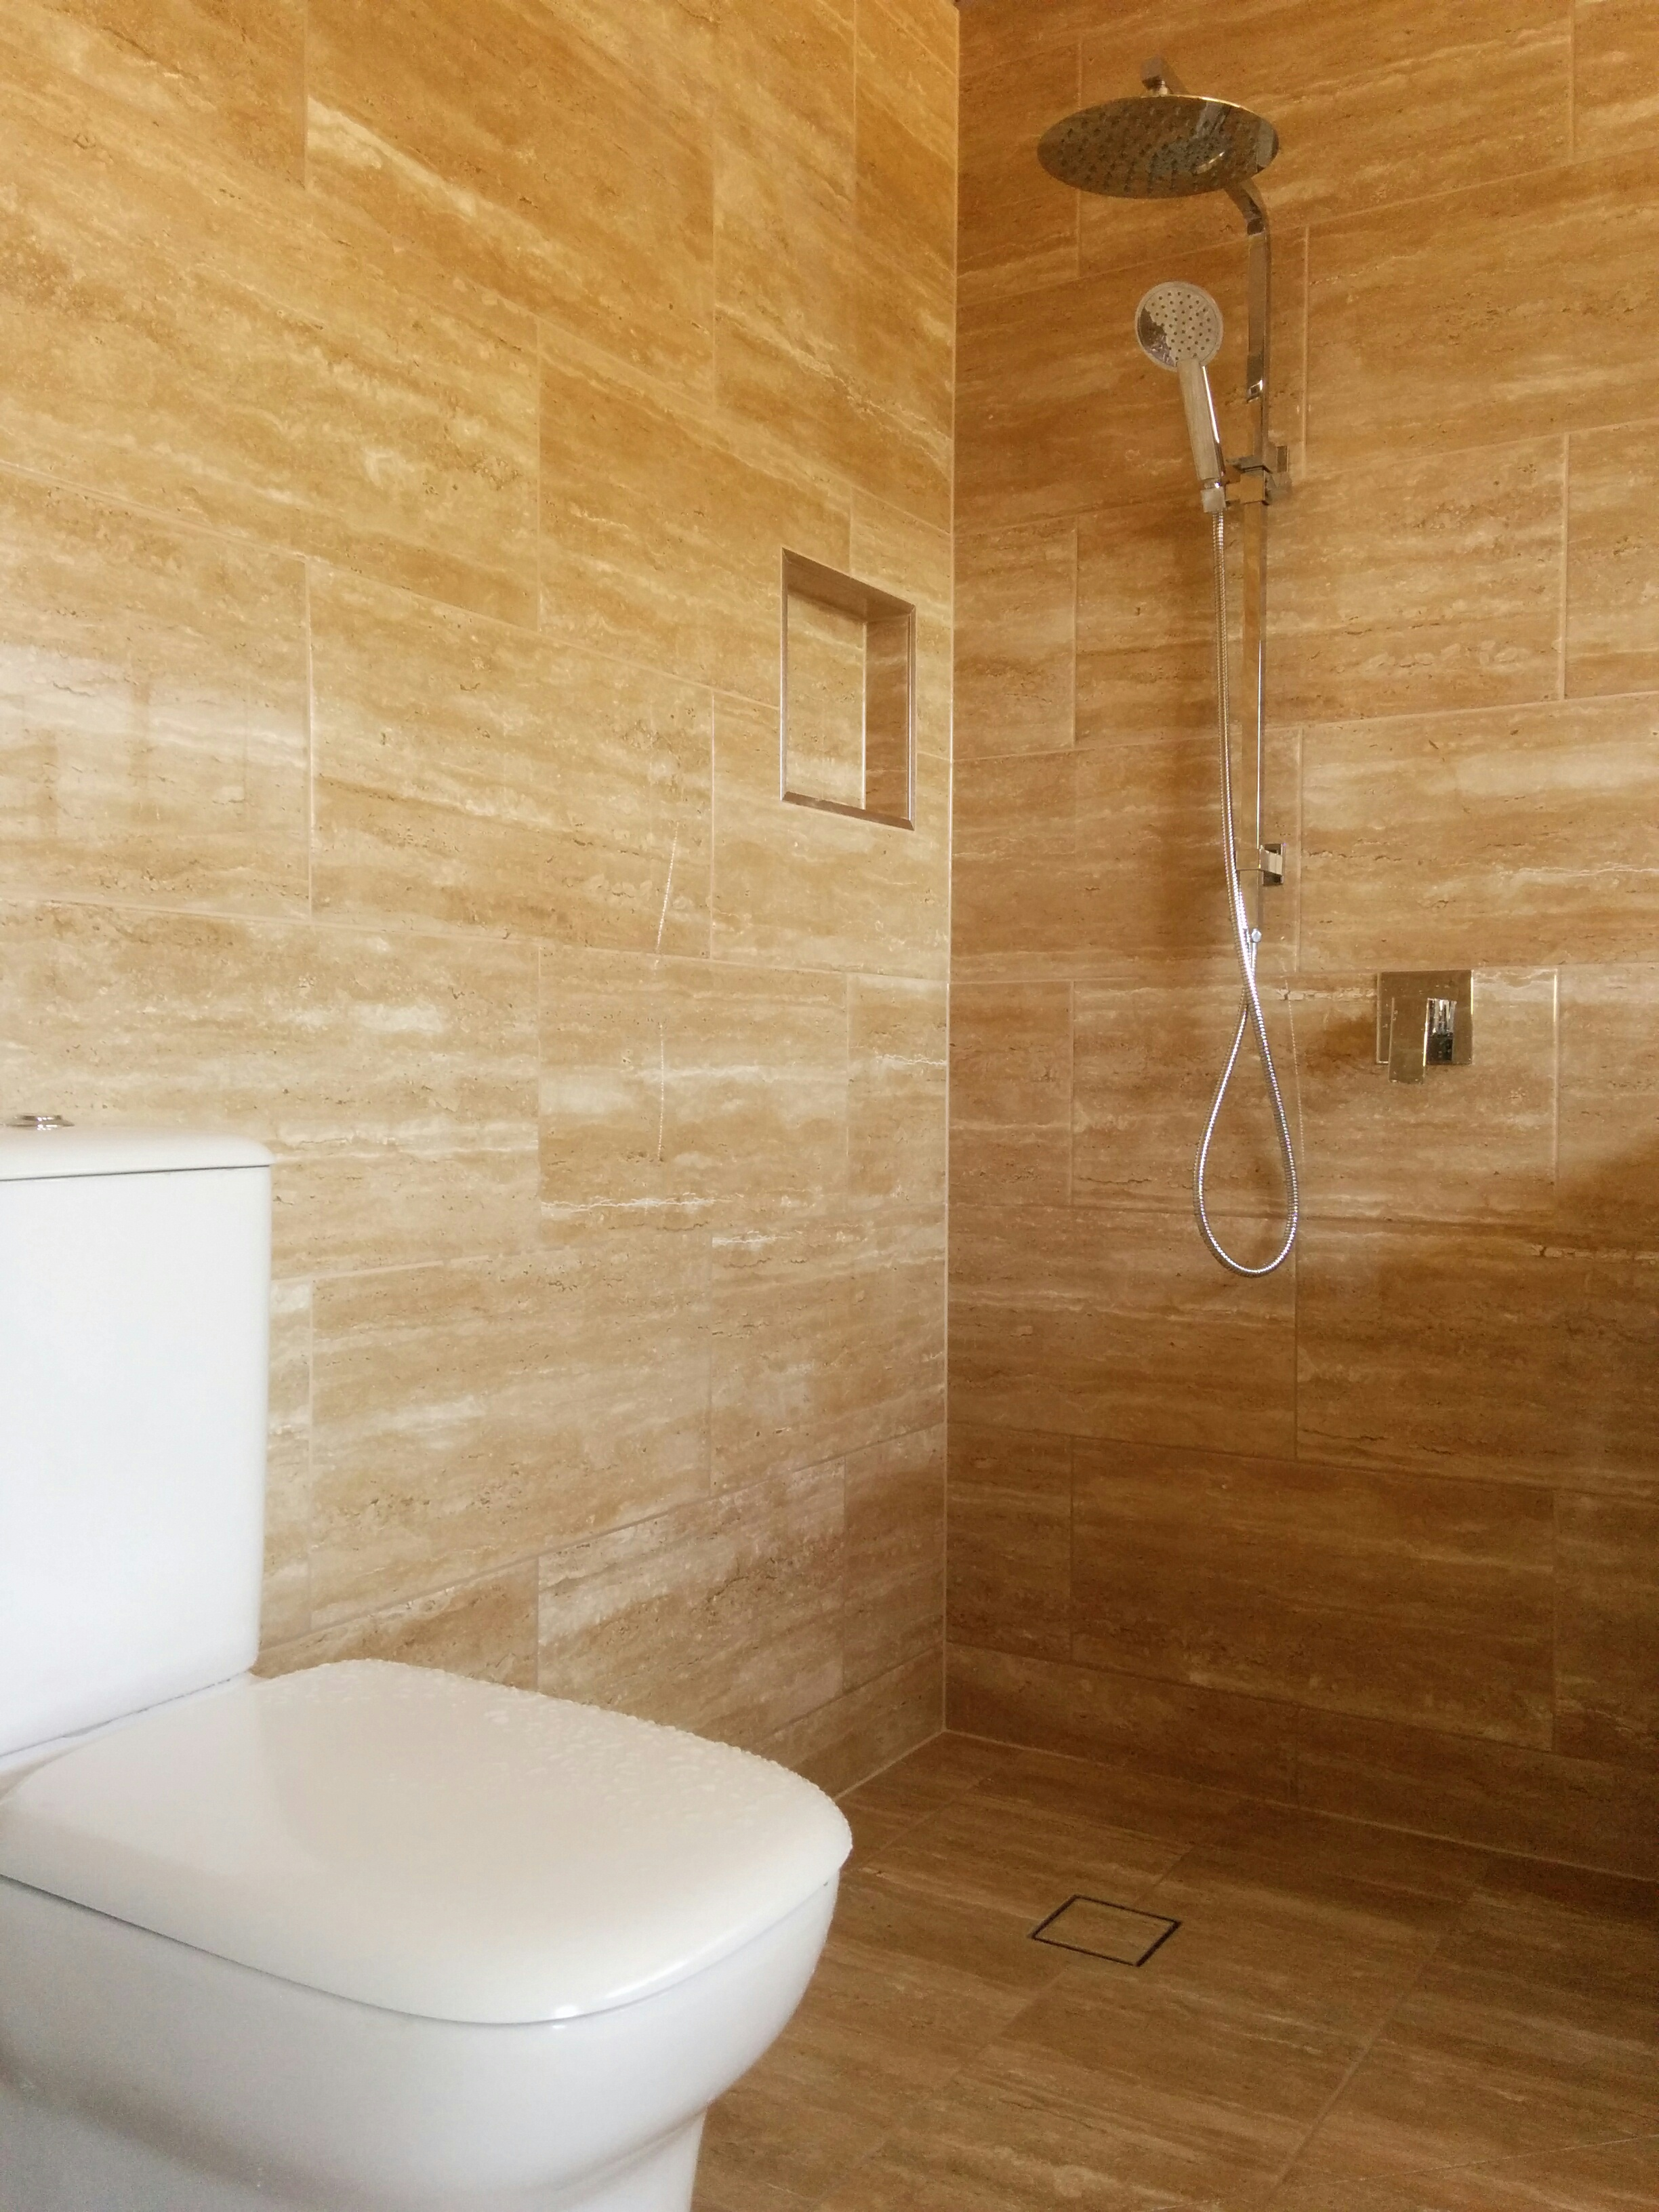 Garage Renovation with Bathroom